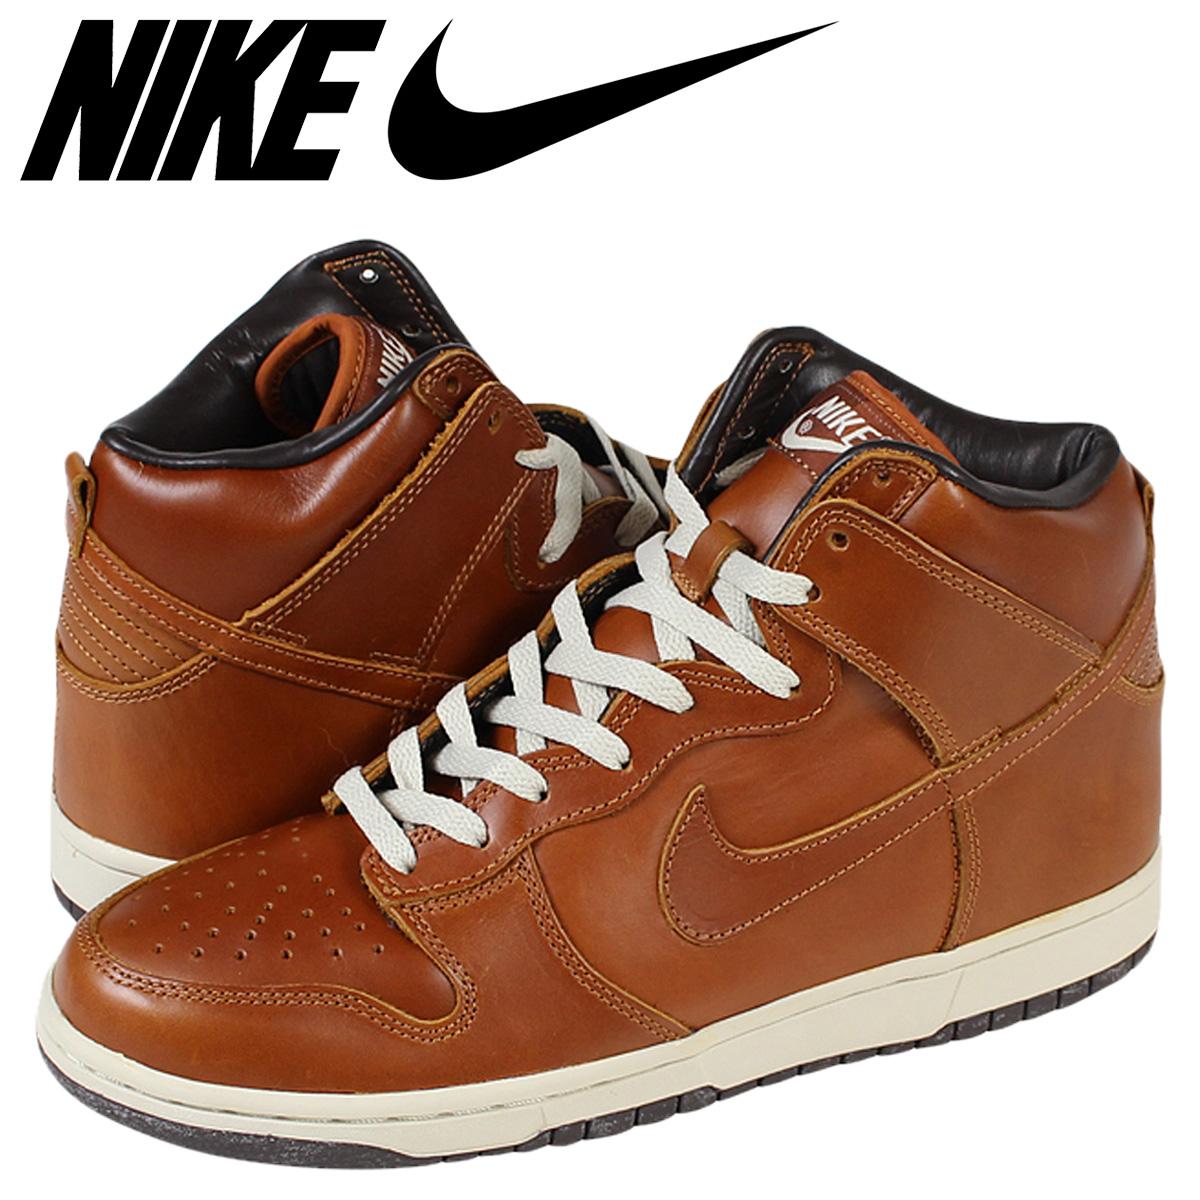 ALLSPORTS  NIKE Nike Dunk DUNK HI PREMIUM CURRY dunk Hi premium 305808-771  Brown mens  5c449cb83191